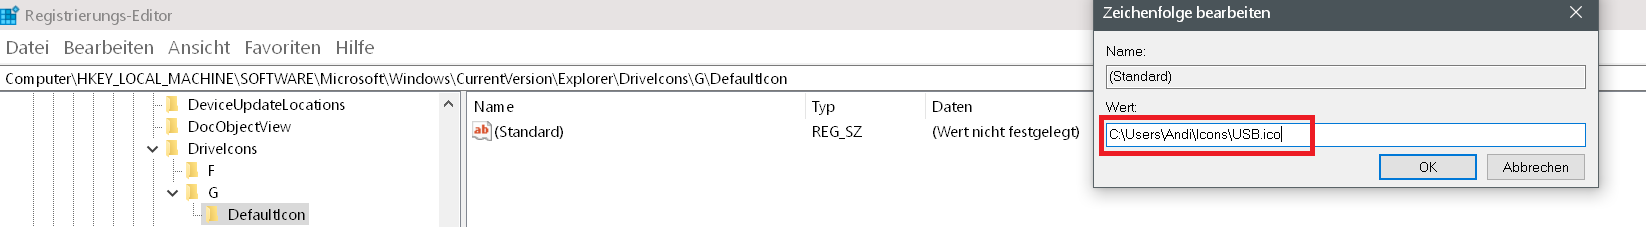 Windows 10 Hardware Icon ändern 12